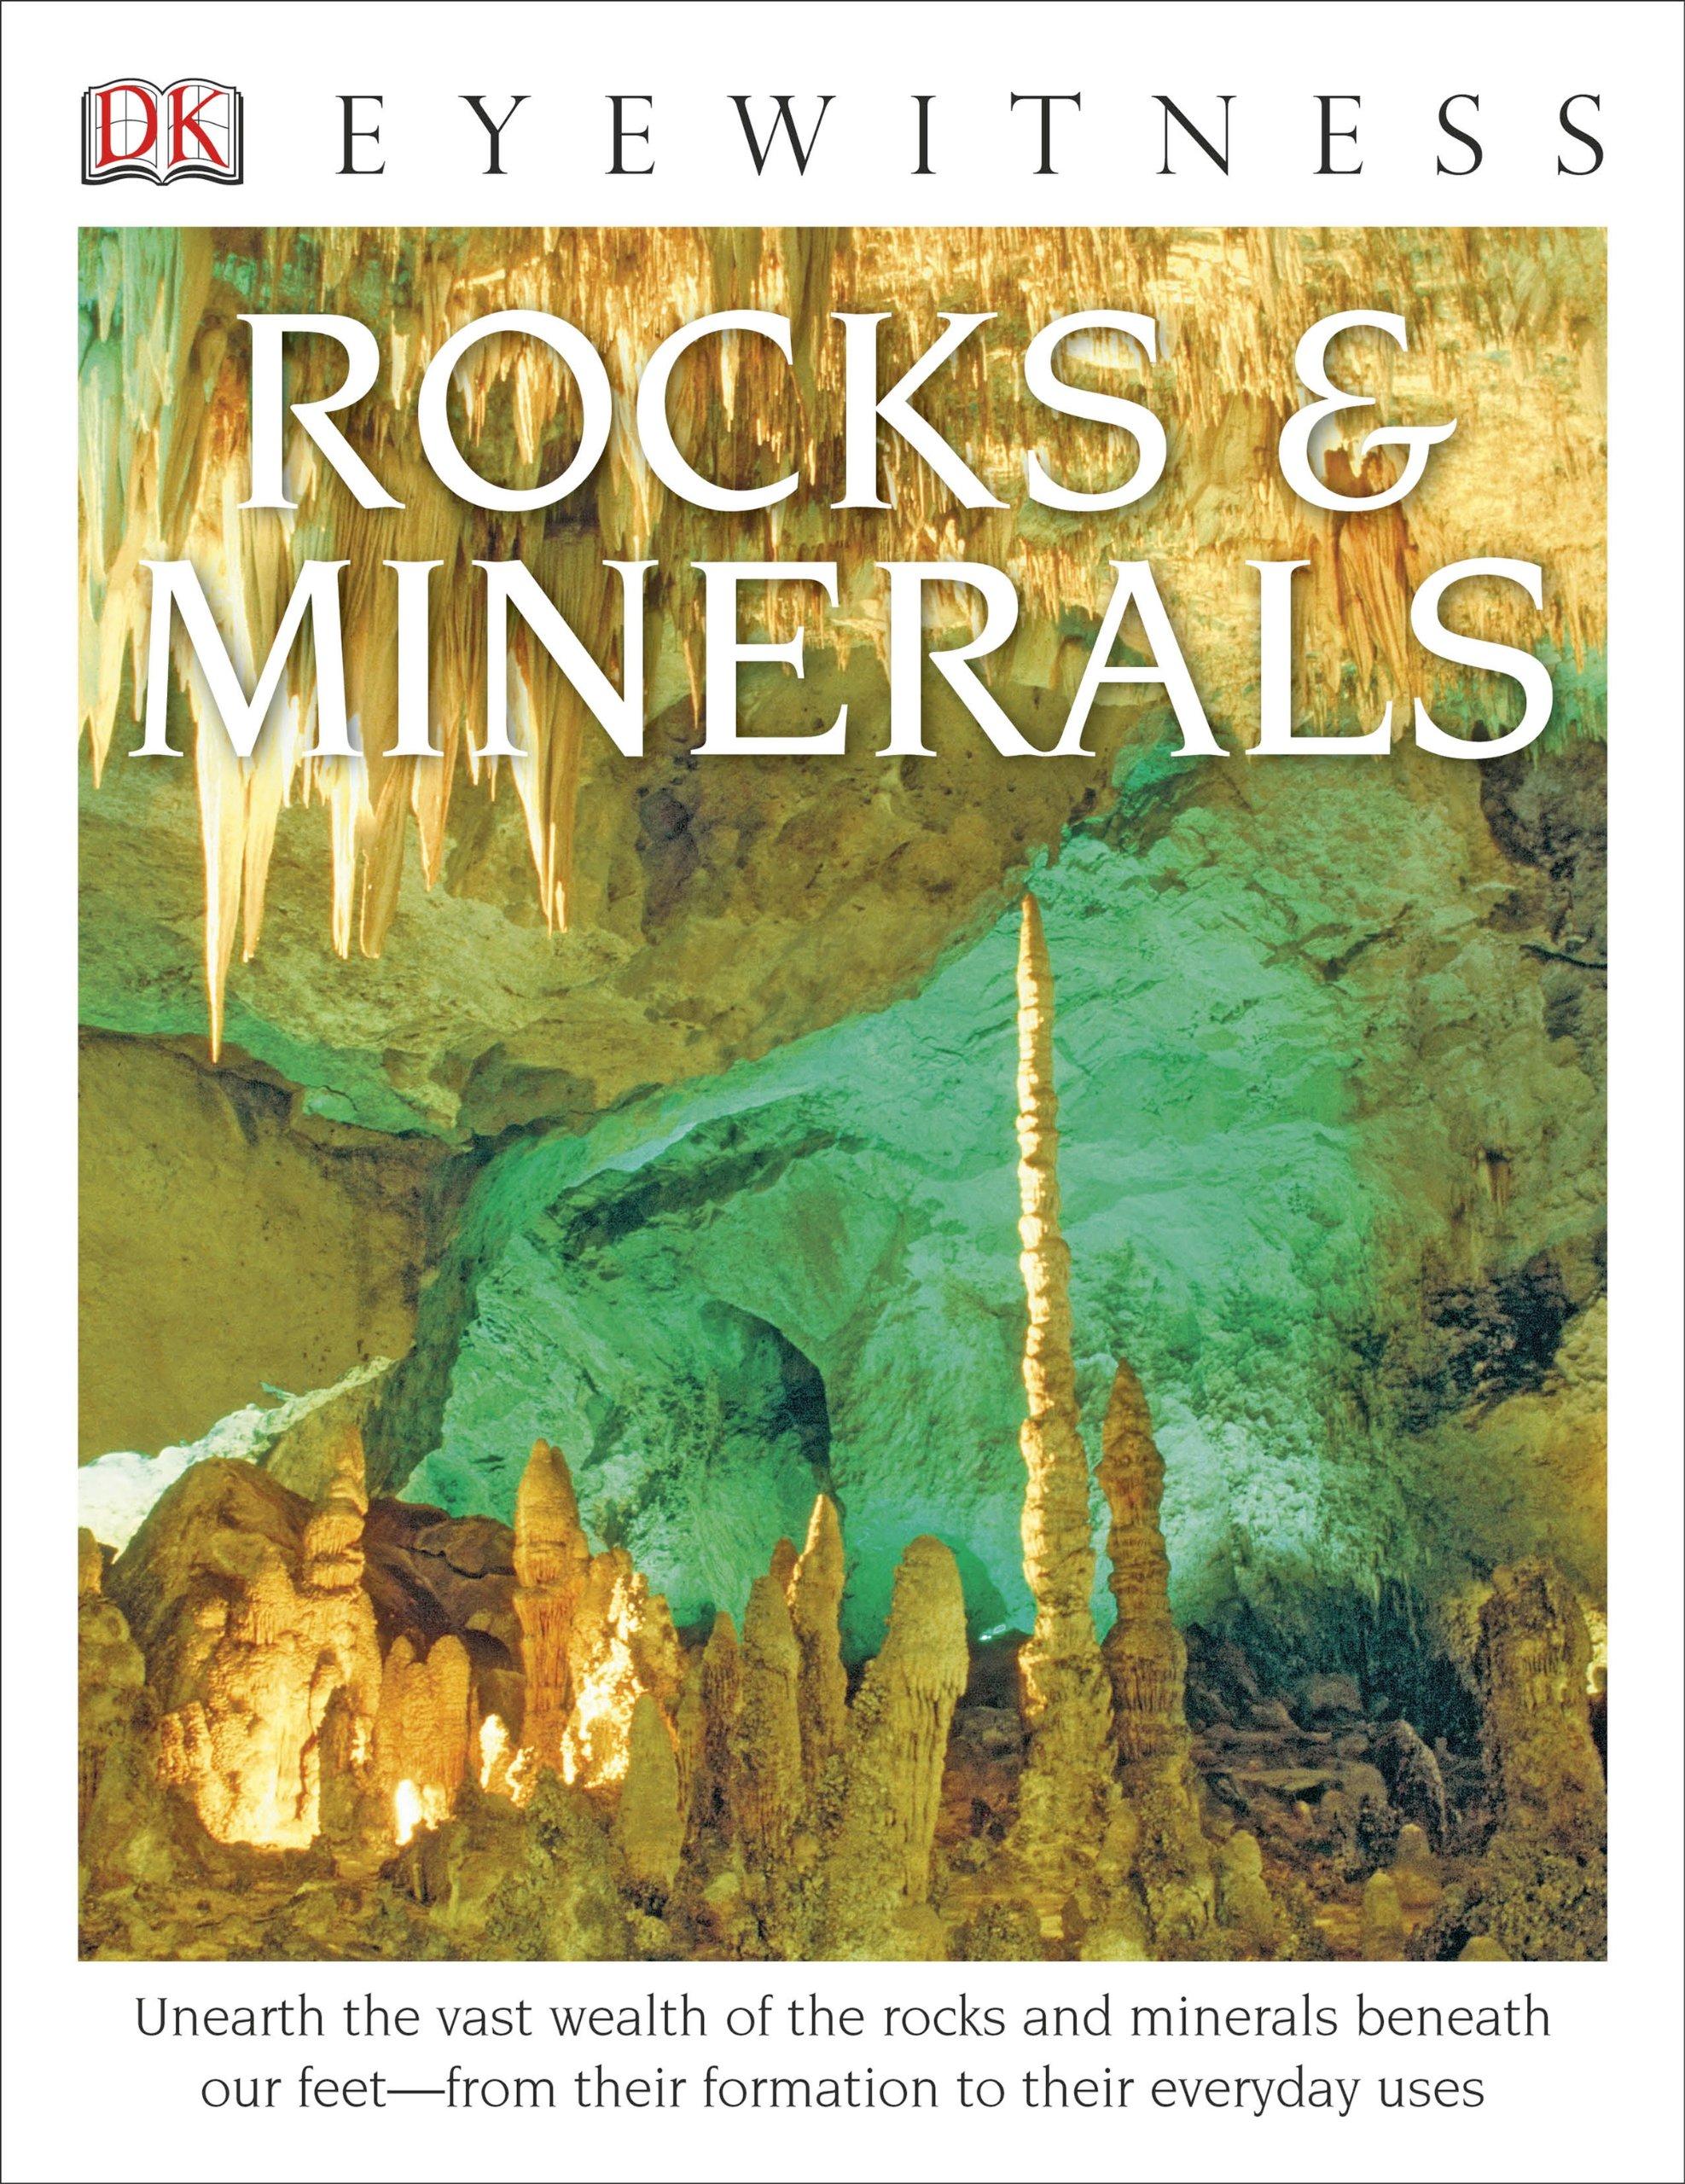 rocksnminerals